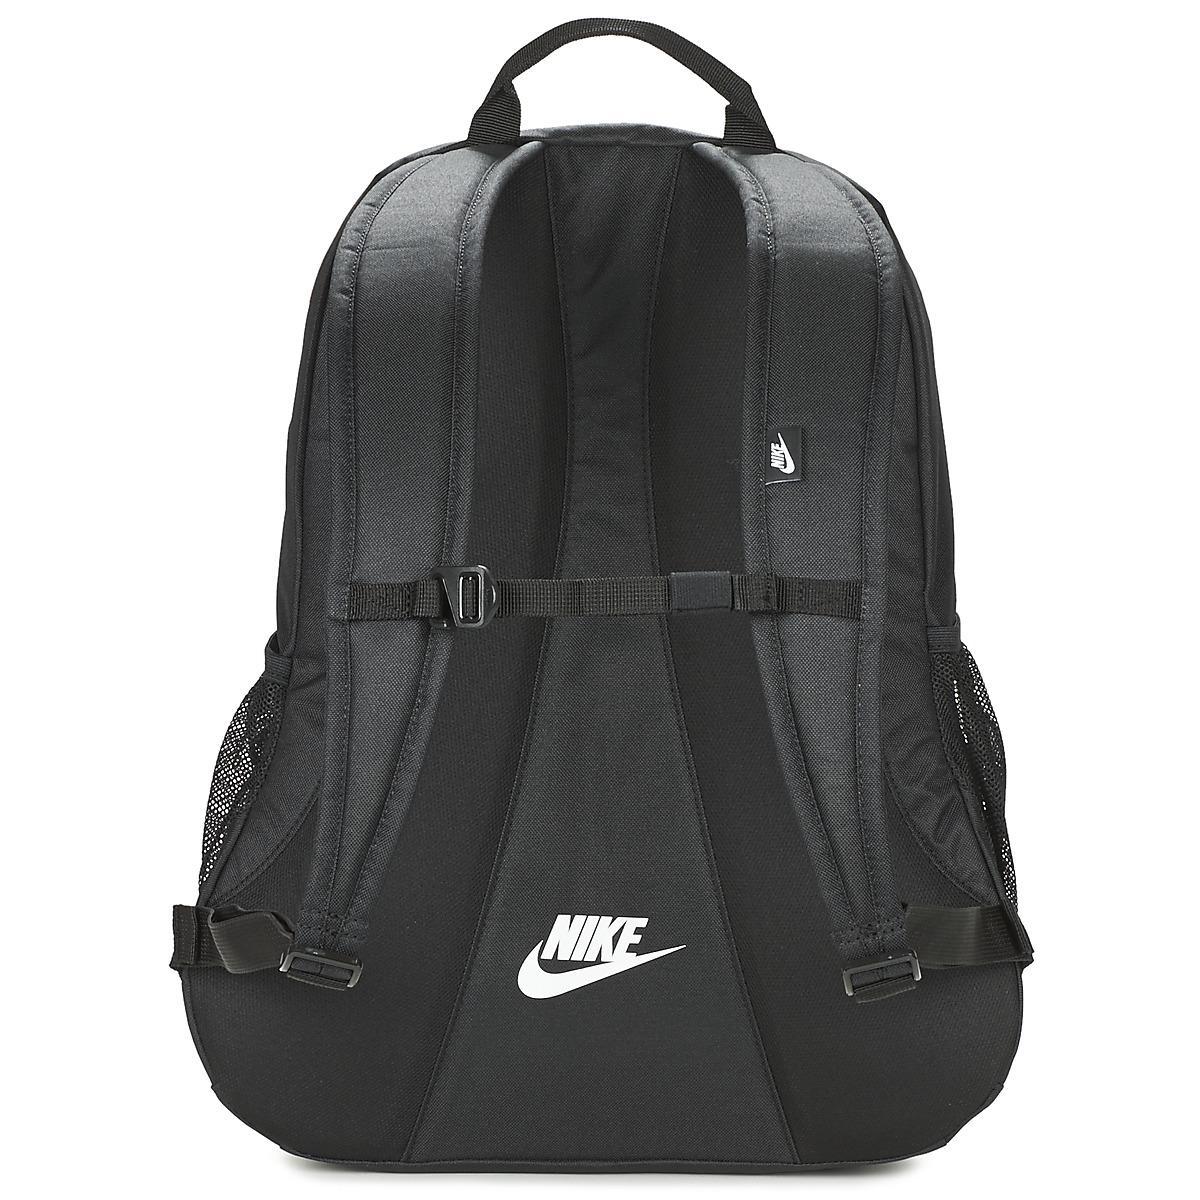 6de4caf7361f Nike - Hayward Futura 2.0 Women s Backpack In Black for Men - Lyst. View  fullscreen